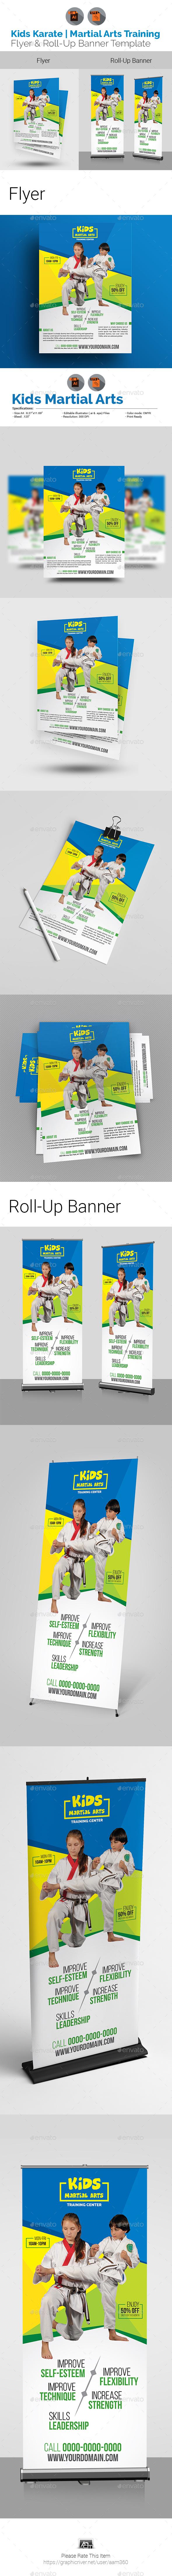 Kids Karate | Martial Arts Training Flyer & Roll Up Bundle - Print Templates